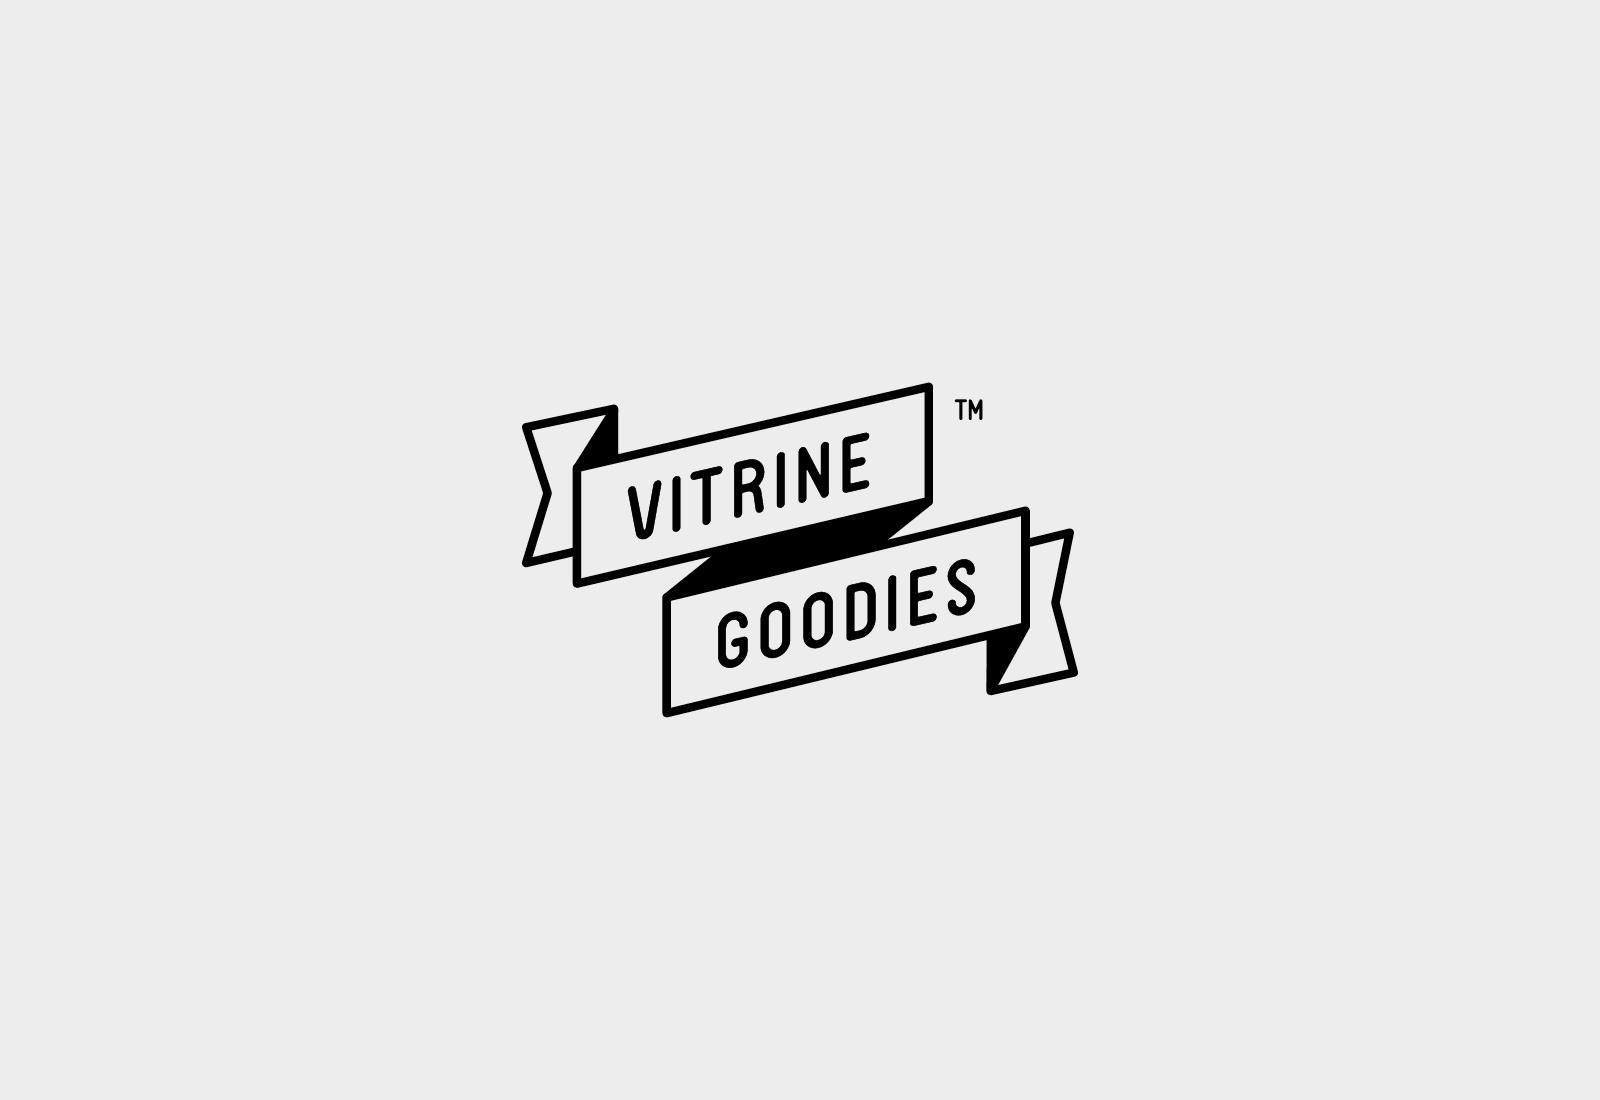 vitrine-goodies